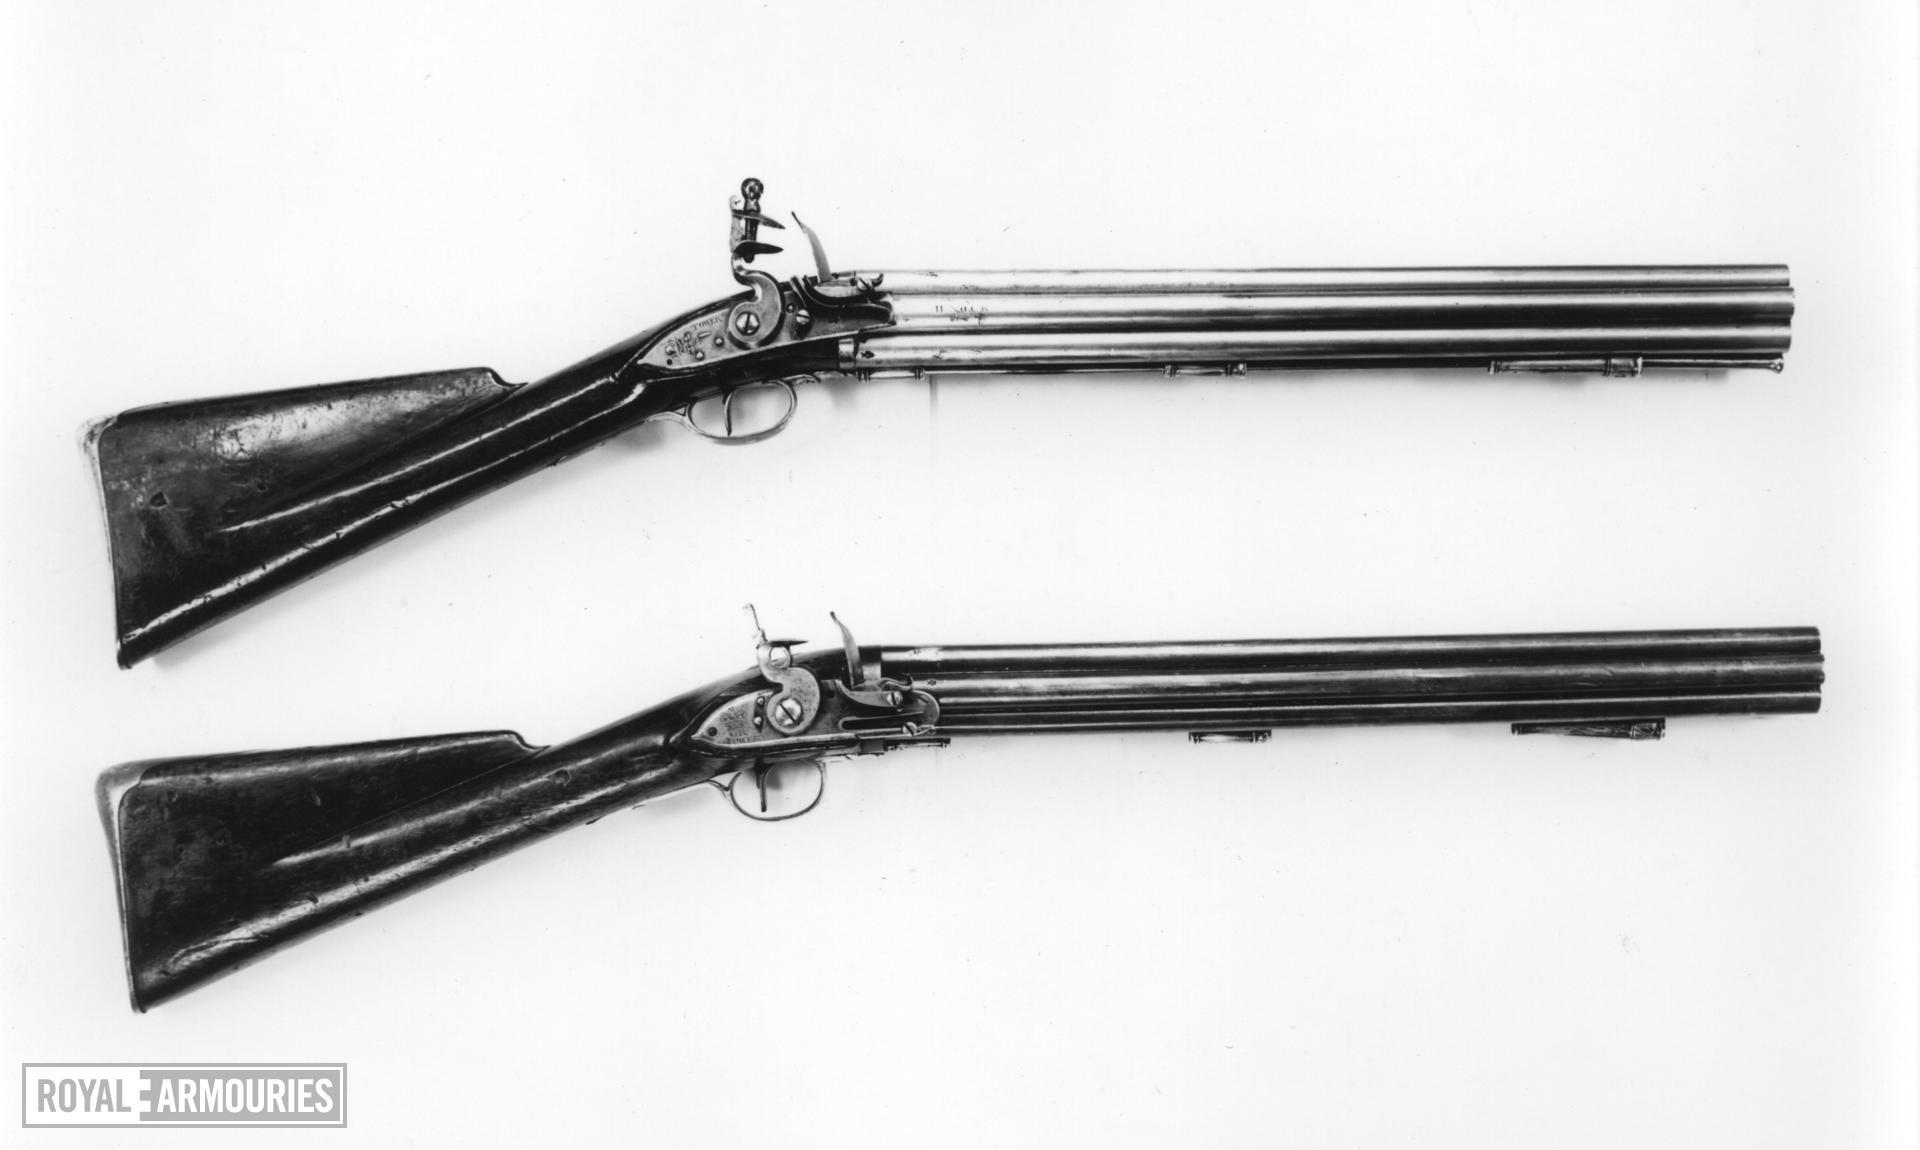 Flintlock military volley gun - Pattern 1780 Nock Volley